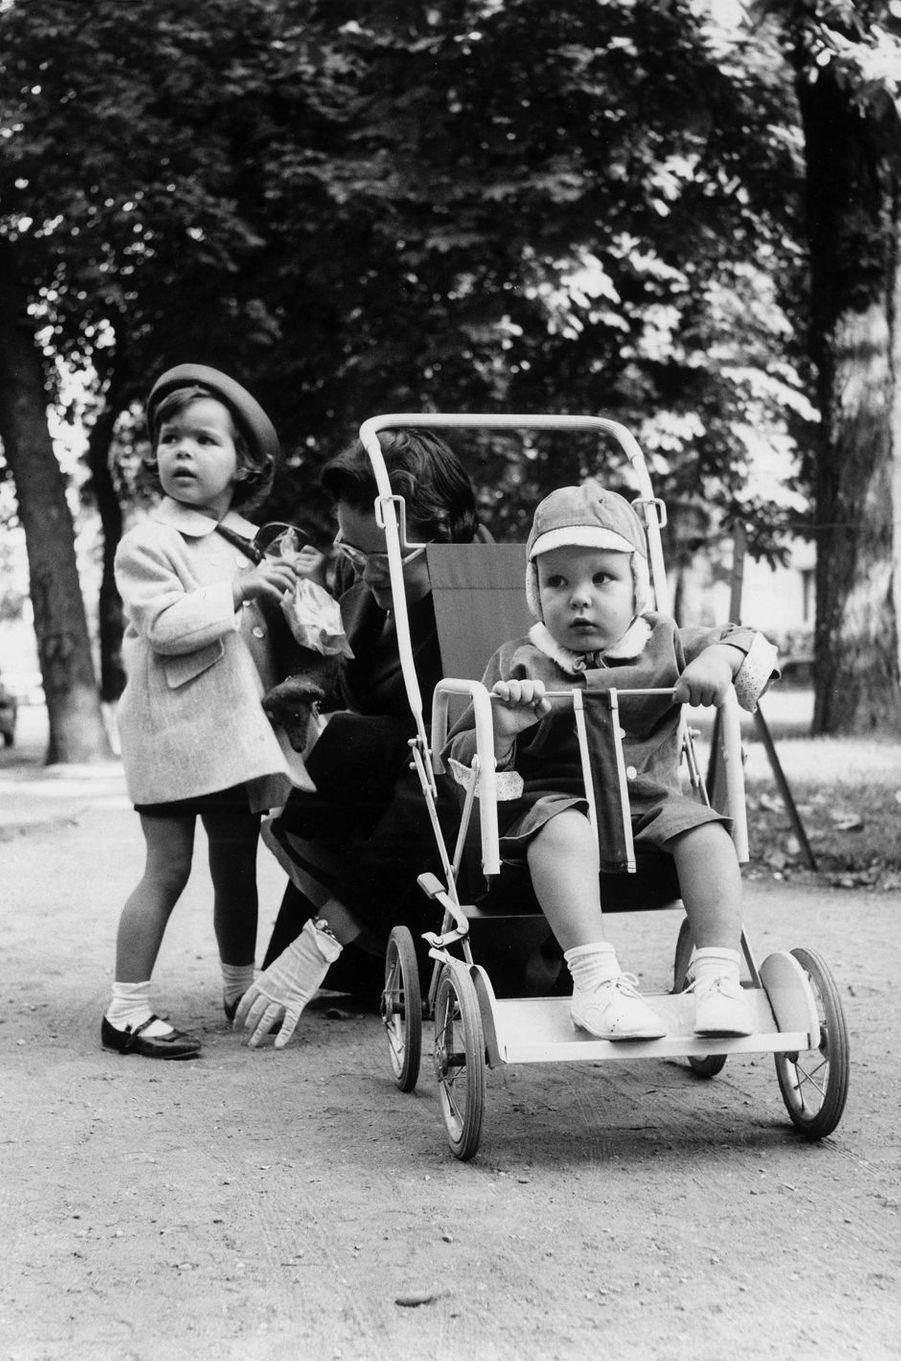 Le prince Albert de Monaco avec la princesse Caroline, le 8 octobre 1959